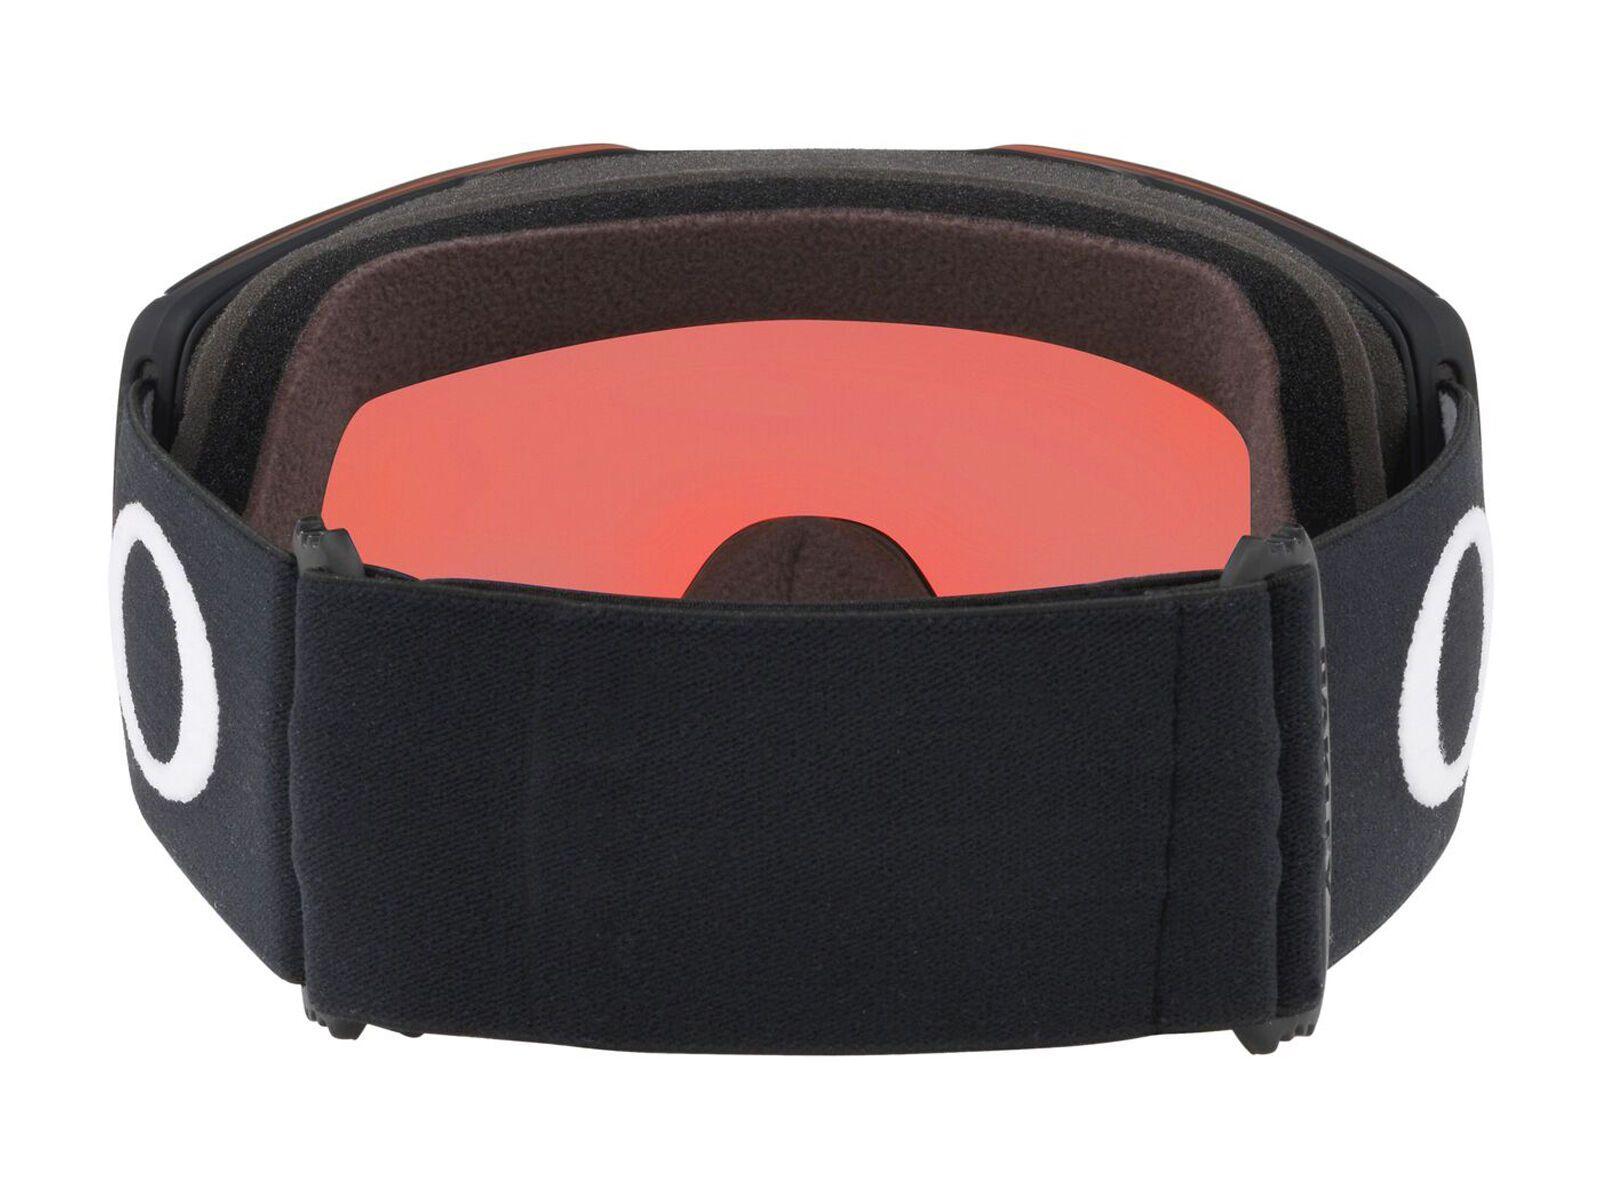 Oakley Fall Line XL - Prizm Sapphire Iridium, matte black/Lens: sapphire iridium | Bild 3